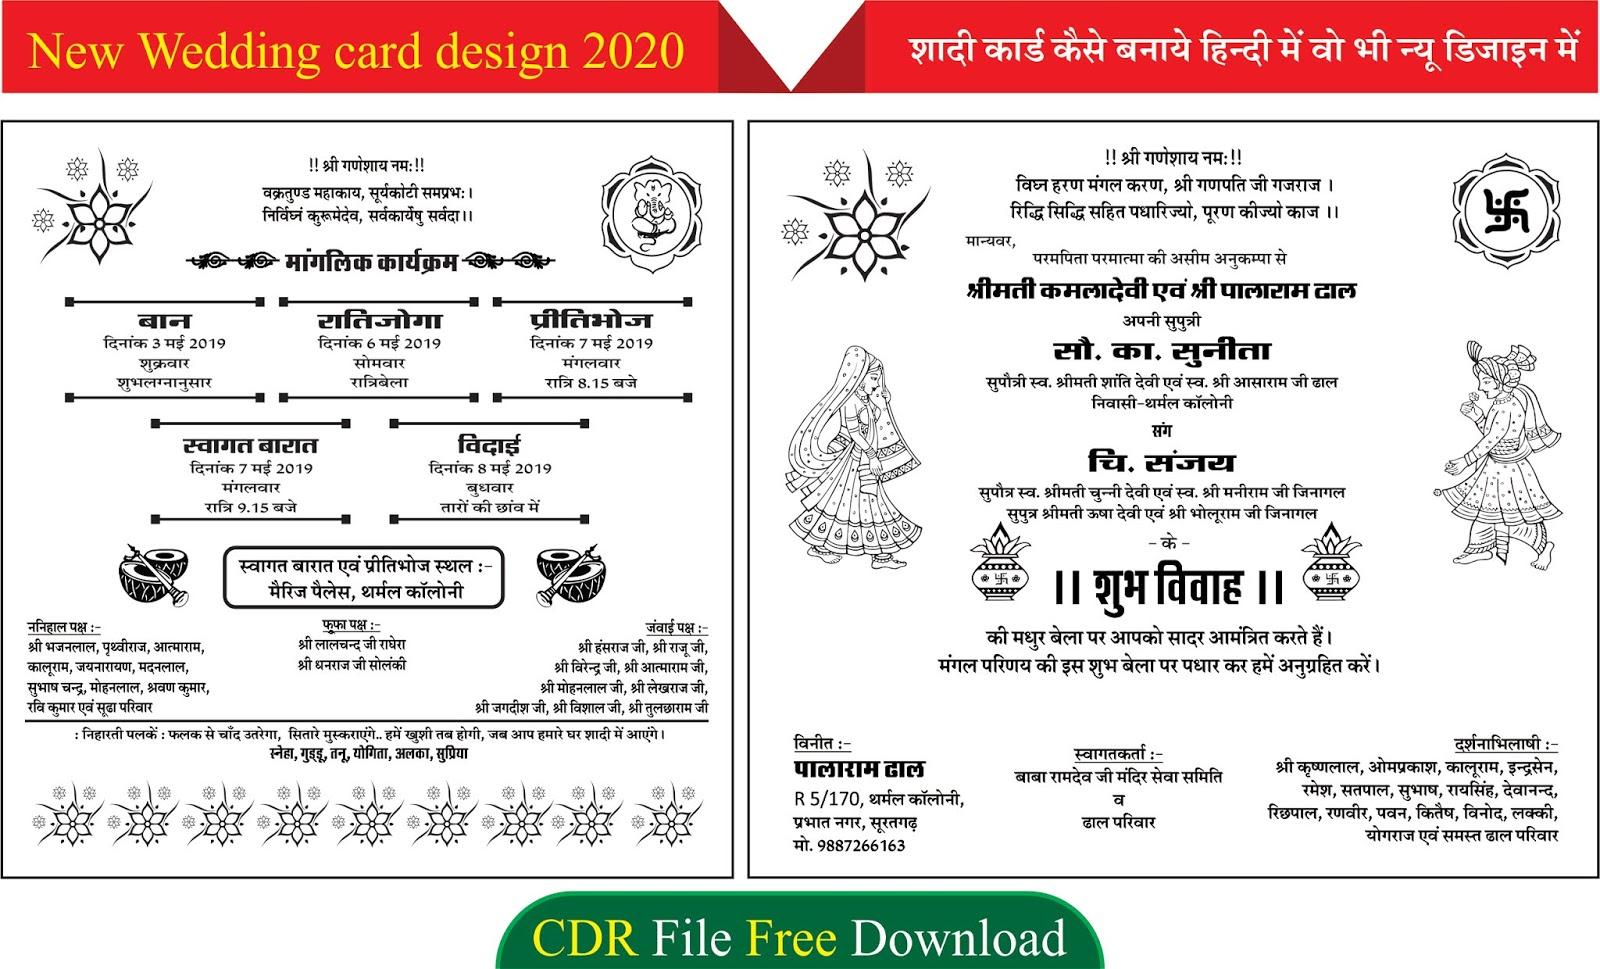 New Shadi Card Design Shadi Card Cdr File Download À¤¶ À¤¦ À¤• À¤° À¤¡ À¤• À¤¸ À¤¬à¤¨ À¤¯ 2 À¤® À¤¨à¤Ÿ À¤® Hindi Wedding Card Design Cdr File Free Download Ar Graphics Ar Graphics